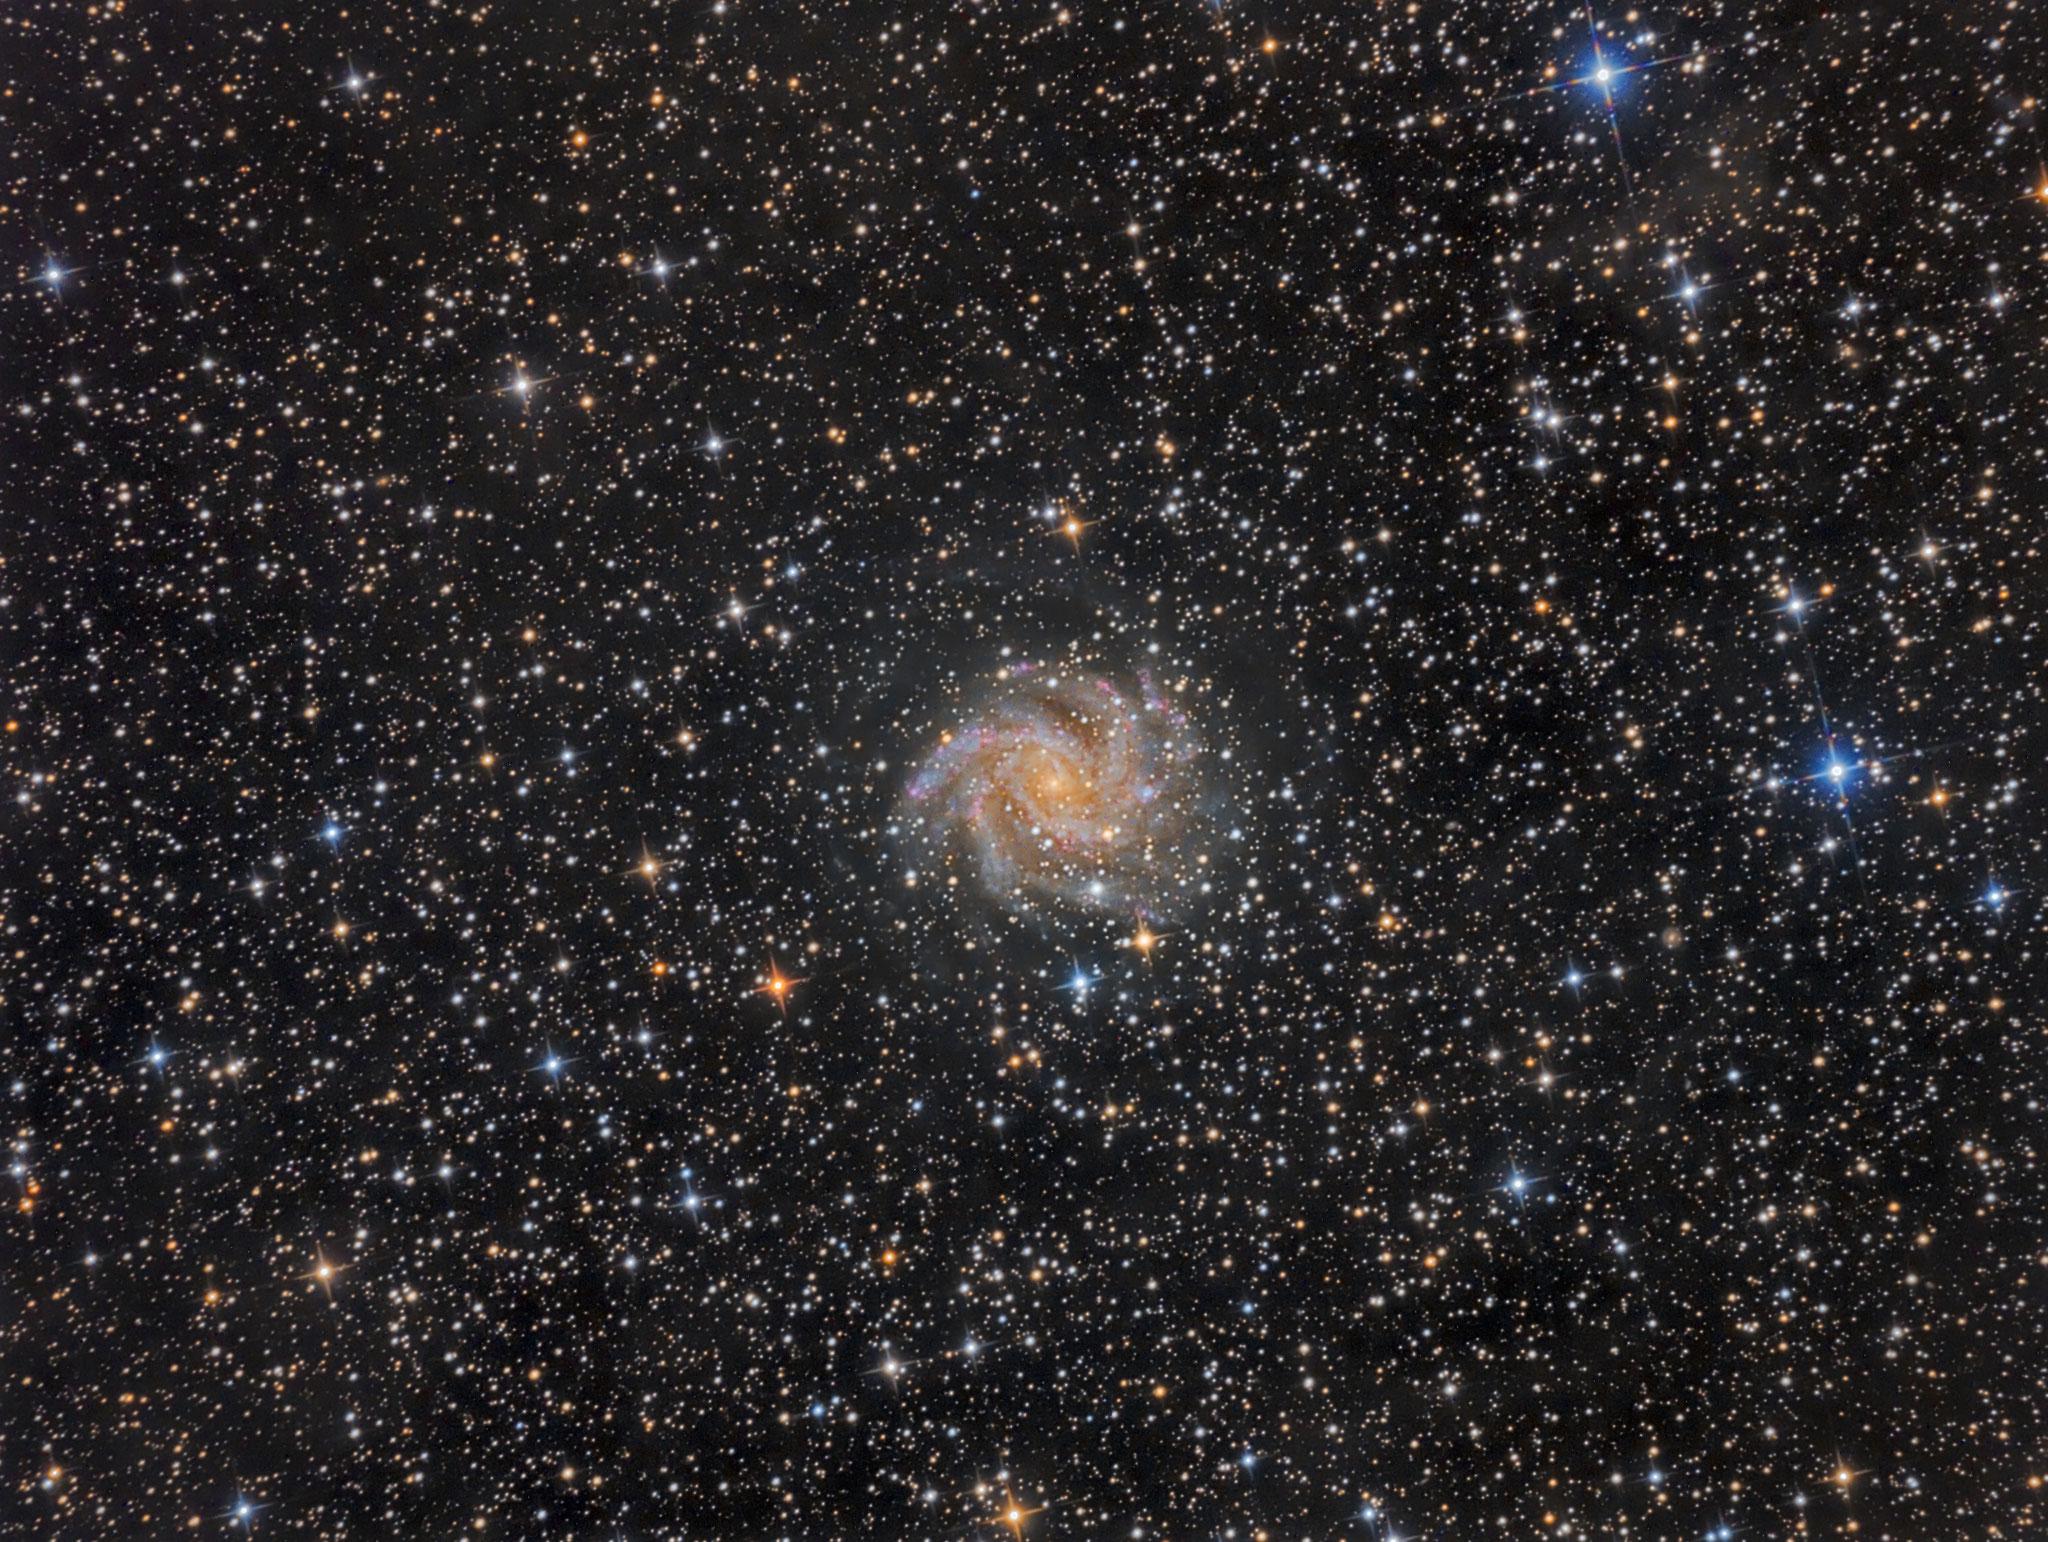 NGC6946, la galaxie du feu d'artifice, L (32x600 bin1), RVB (7x180 bin2), Nicolas, 2 septembre 2016